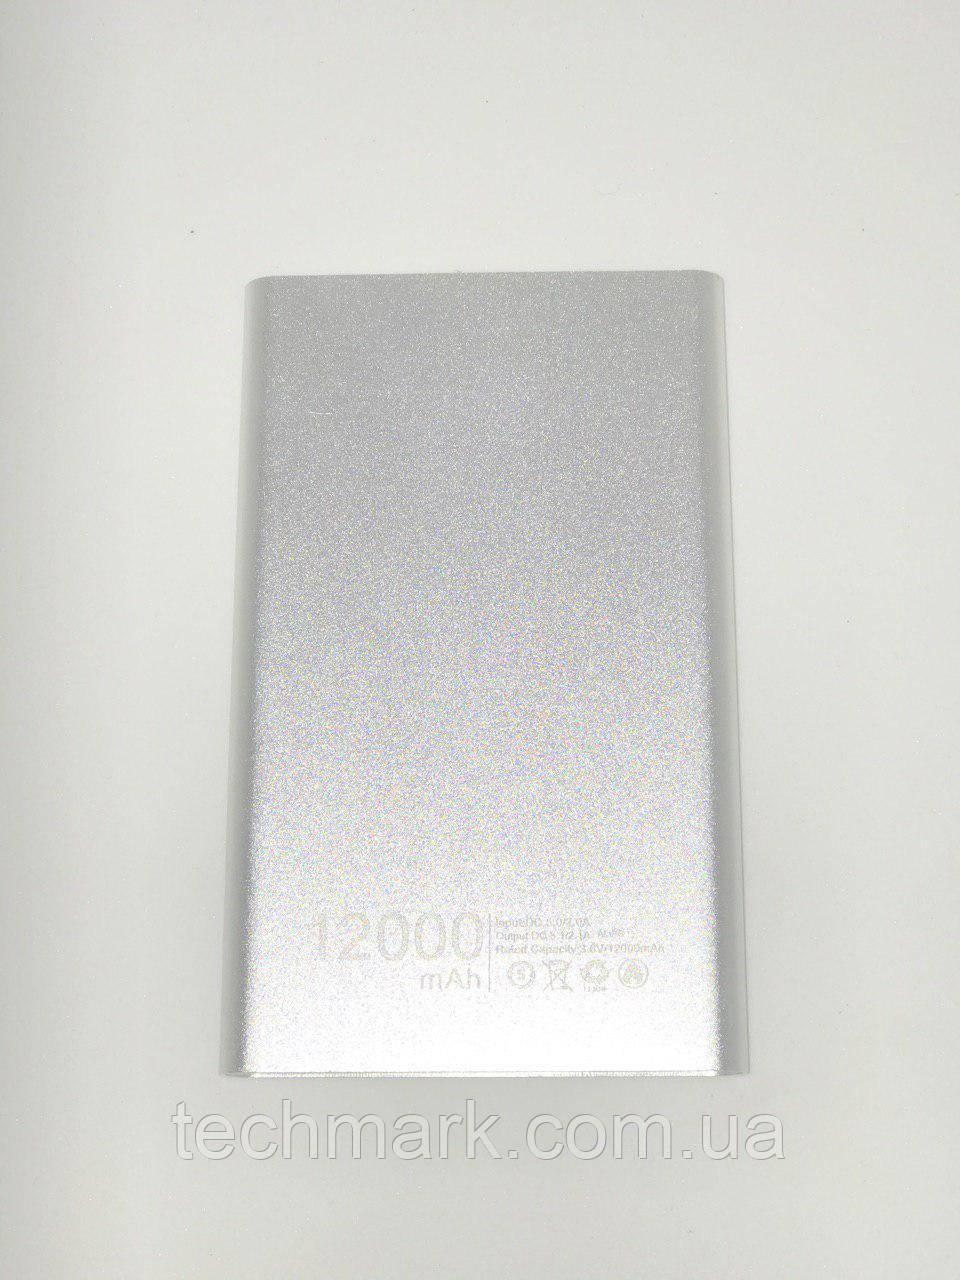 Power Bank MI SLIM 12000 mAh